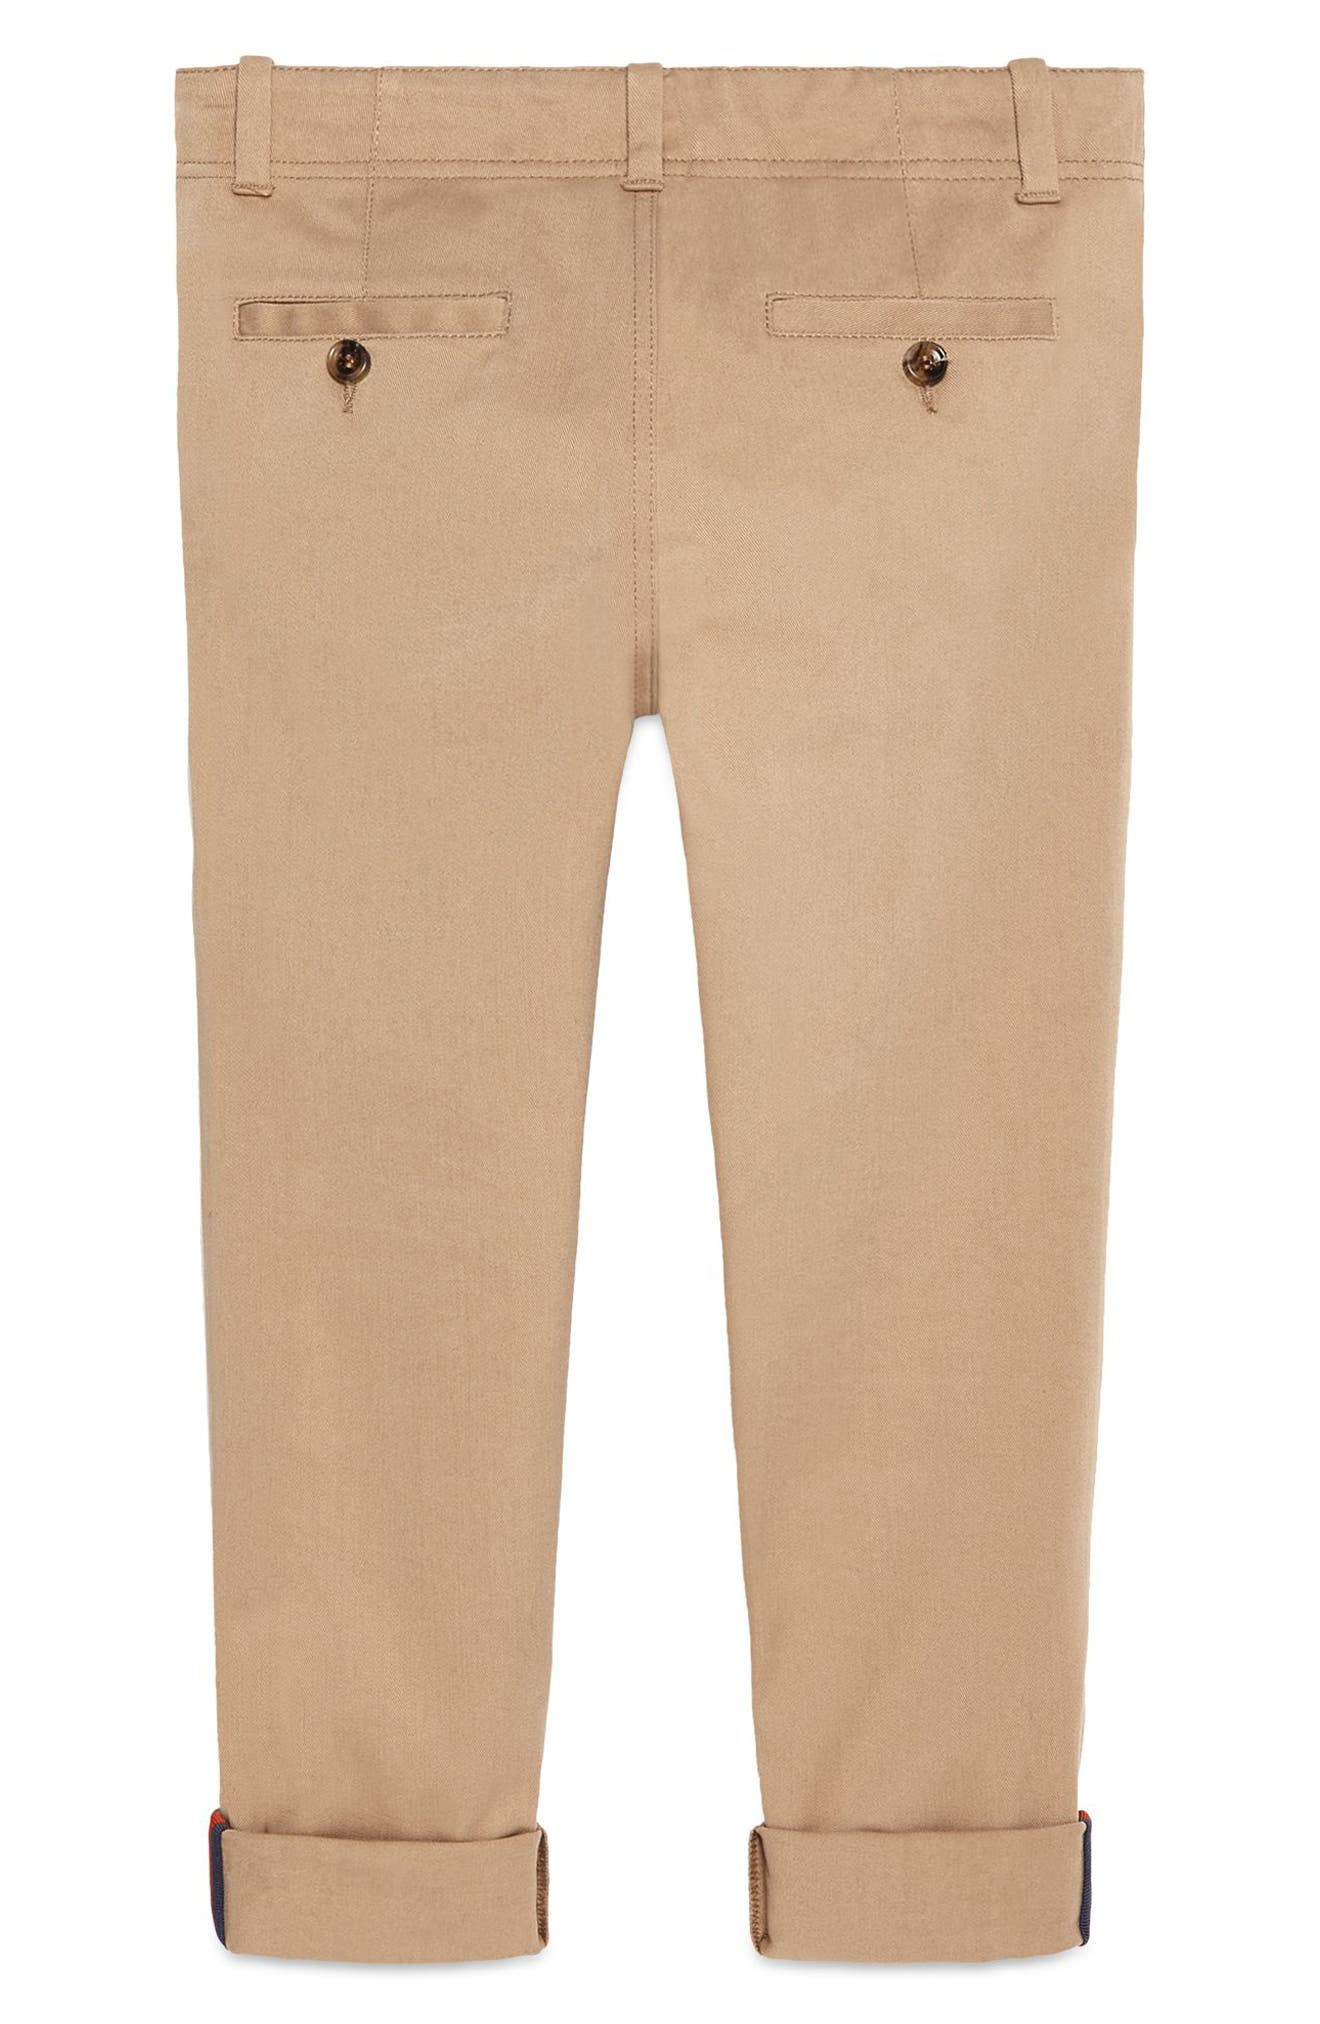 Urban Stripe Pants,                             Alternate thumbnail 2, color,                             Sugarcane/ Blue/ Red